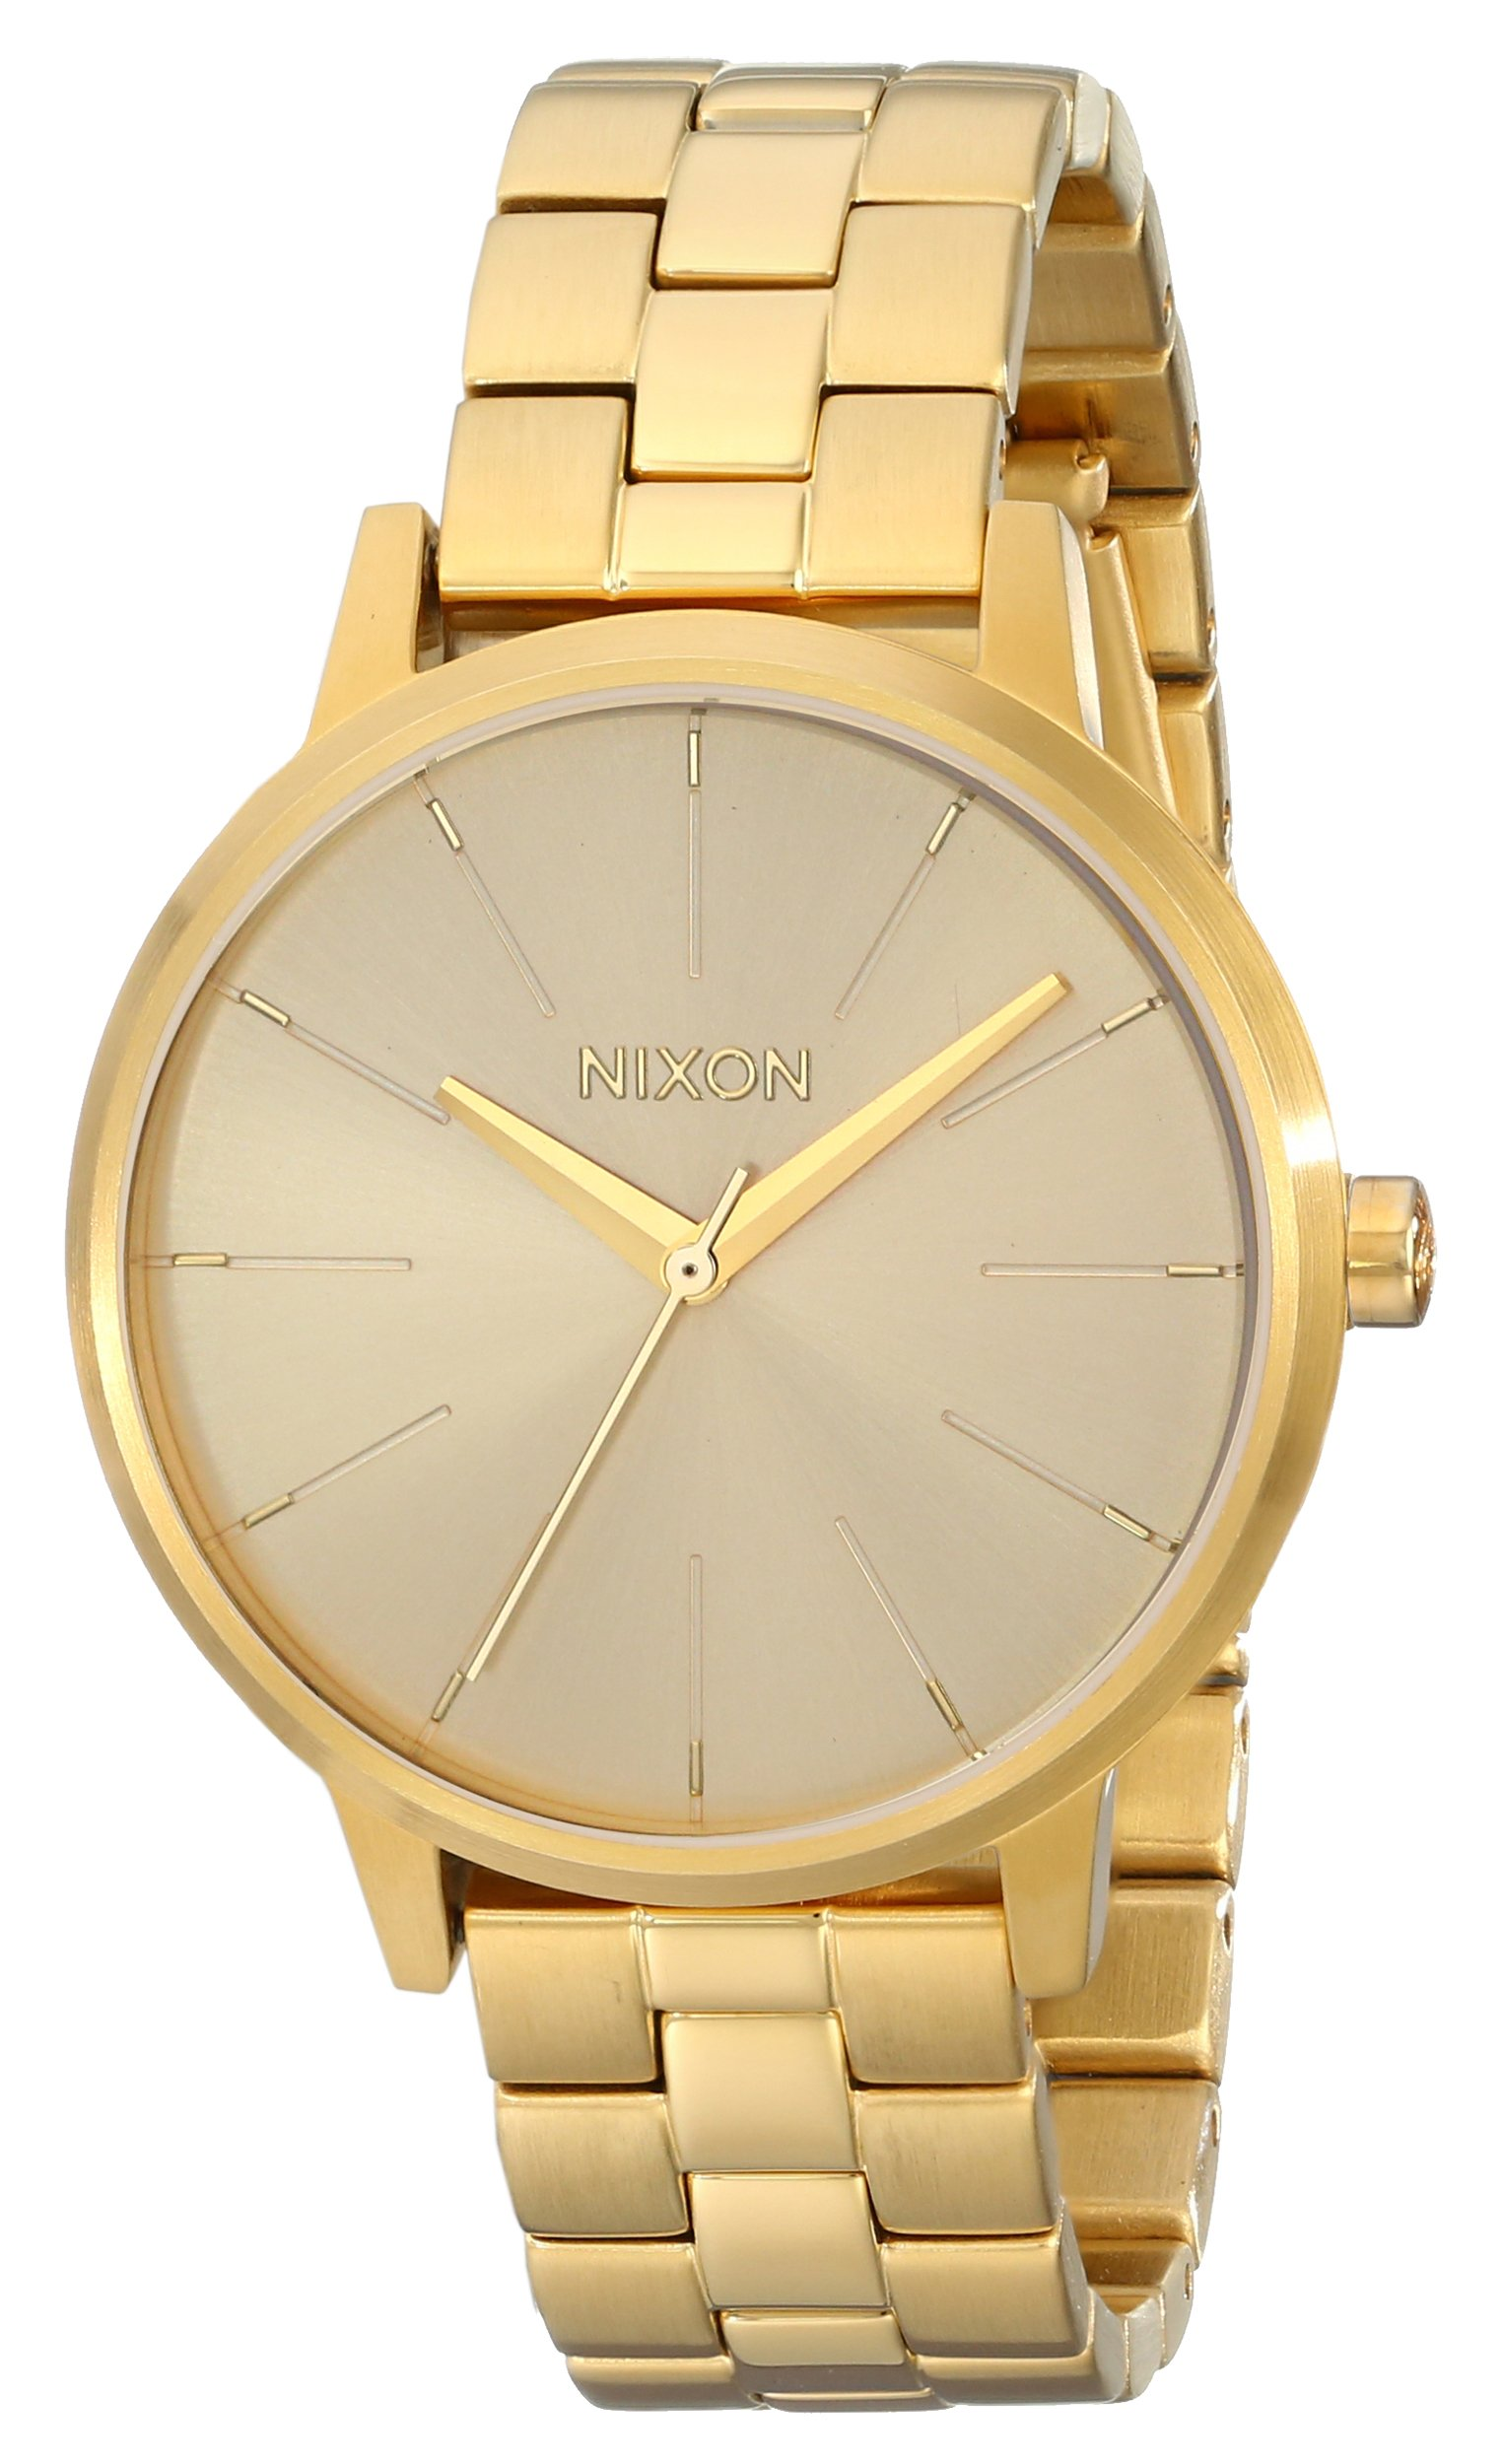 Nixon Unisex Kensington All Gold Watch by NIXON